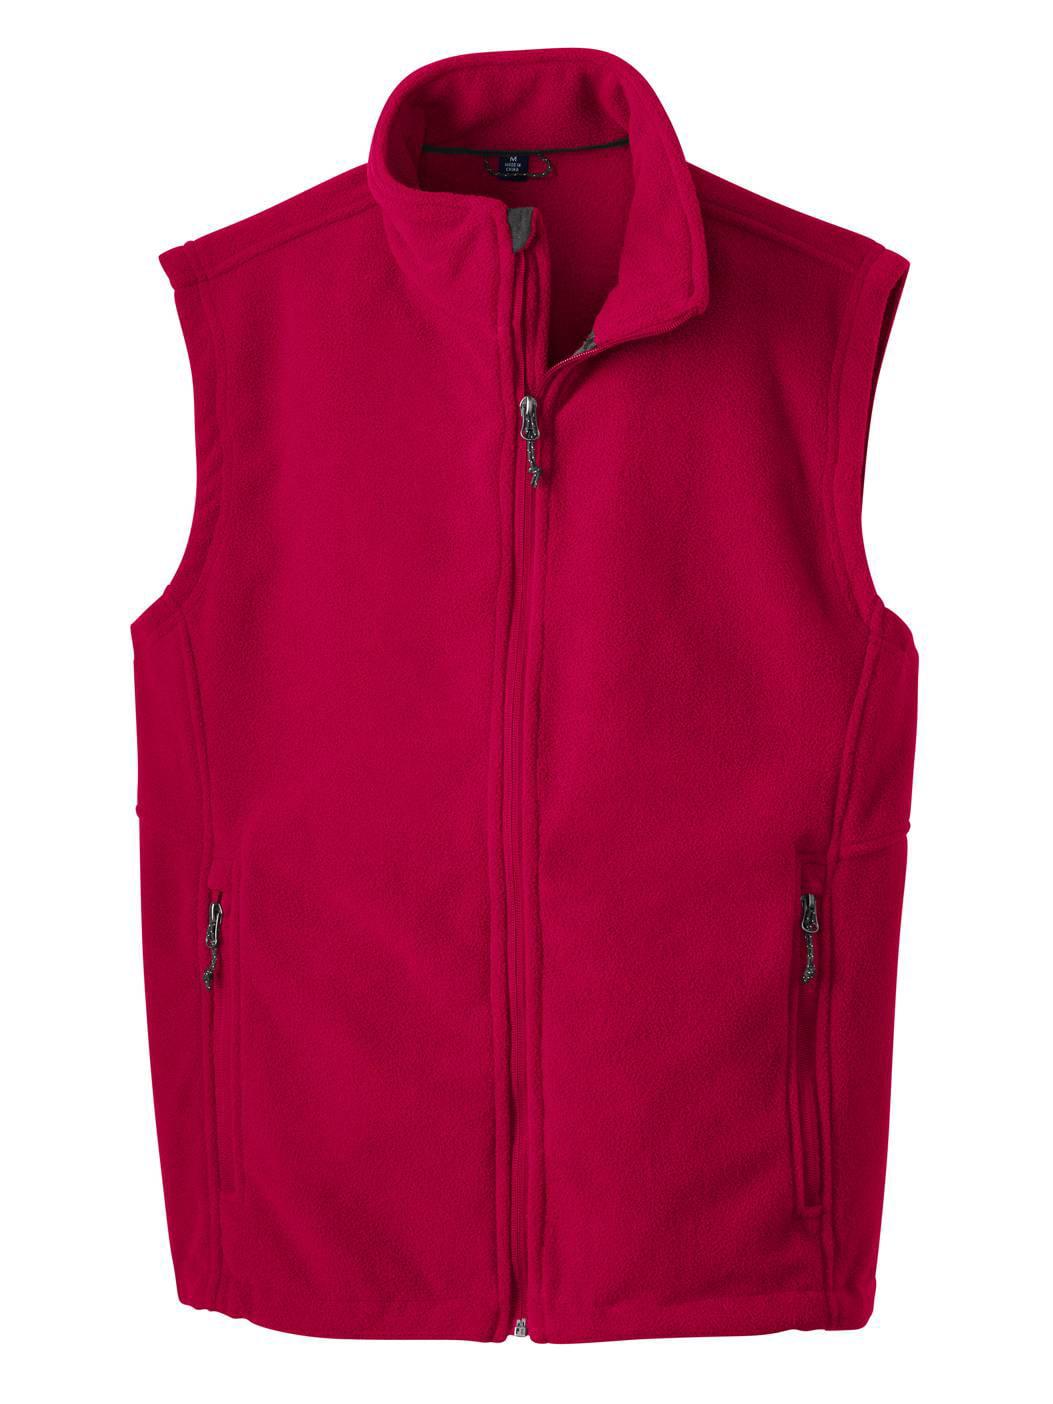 Gravity Threads Soft and Warm Fleece Vest